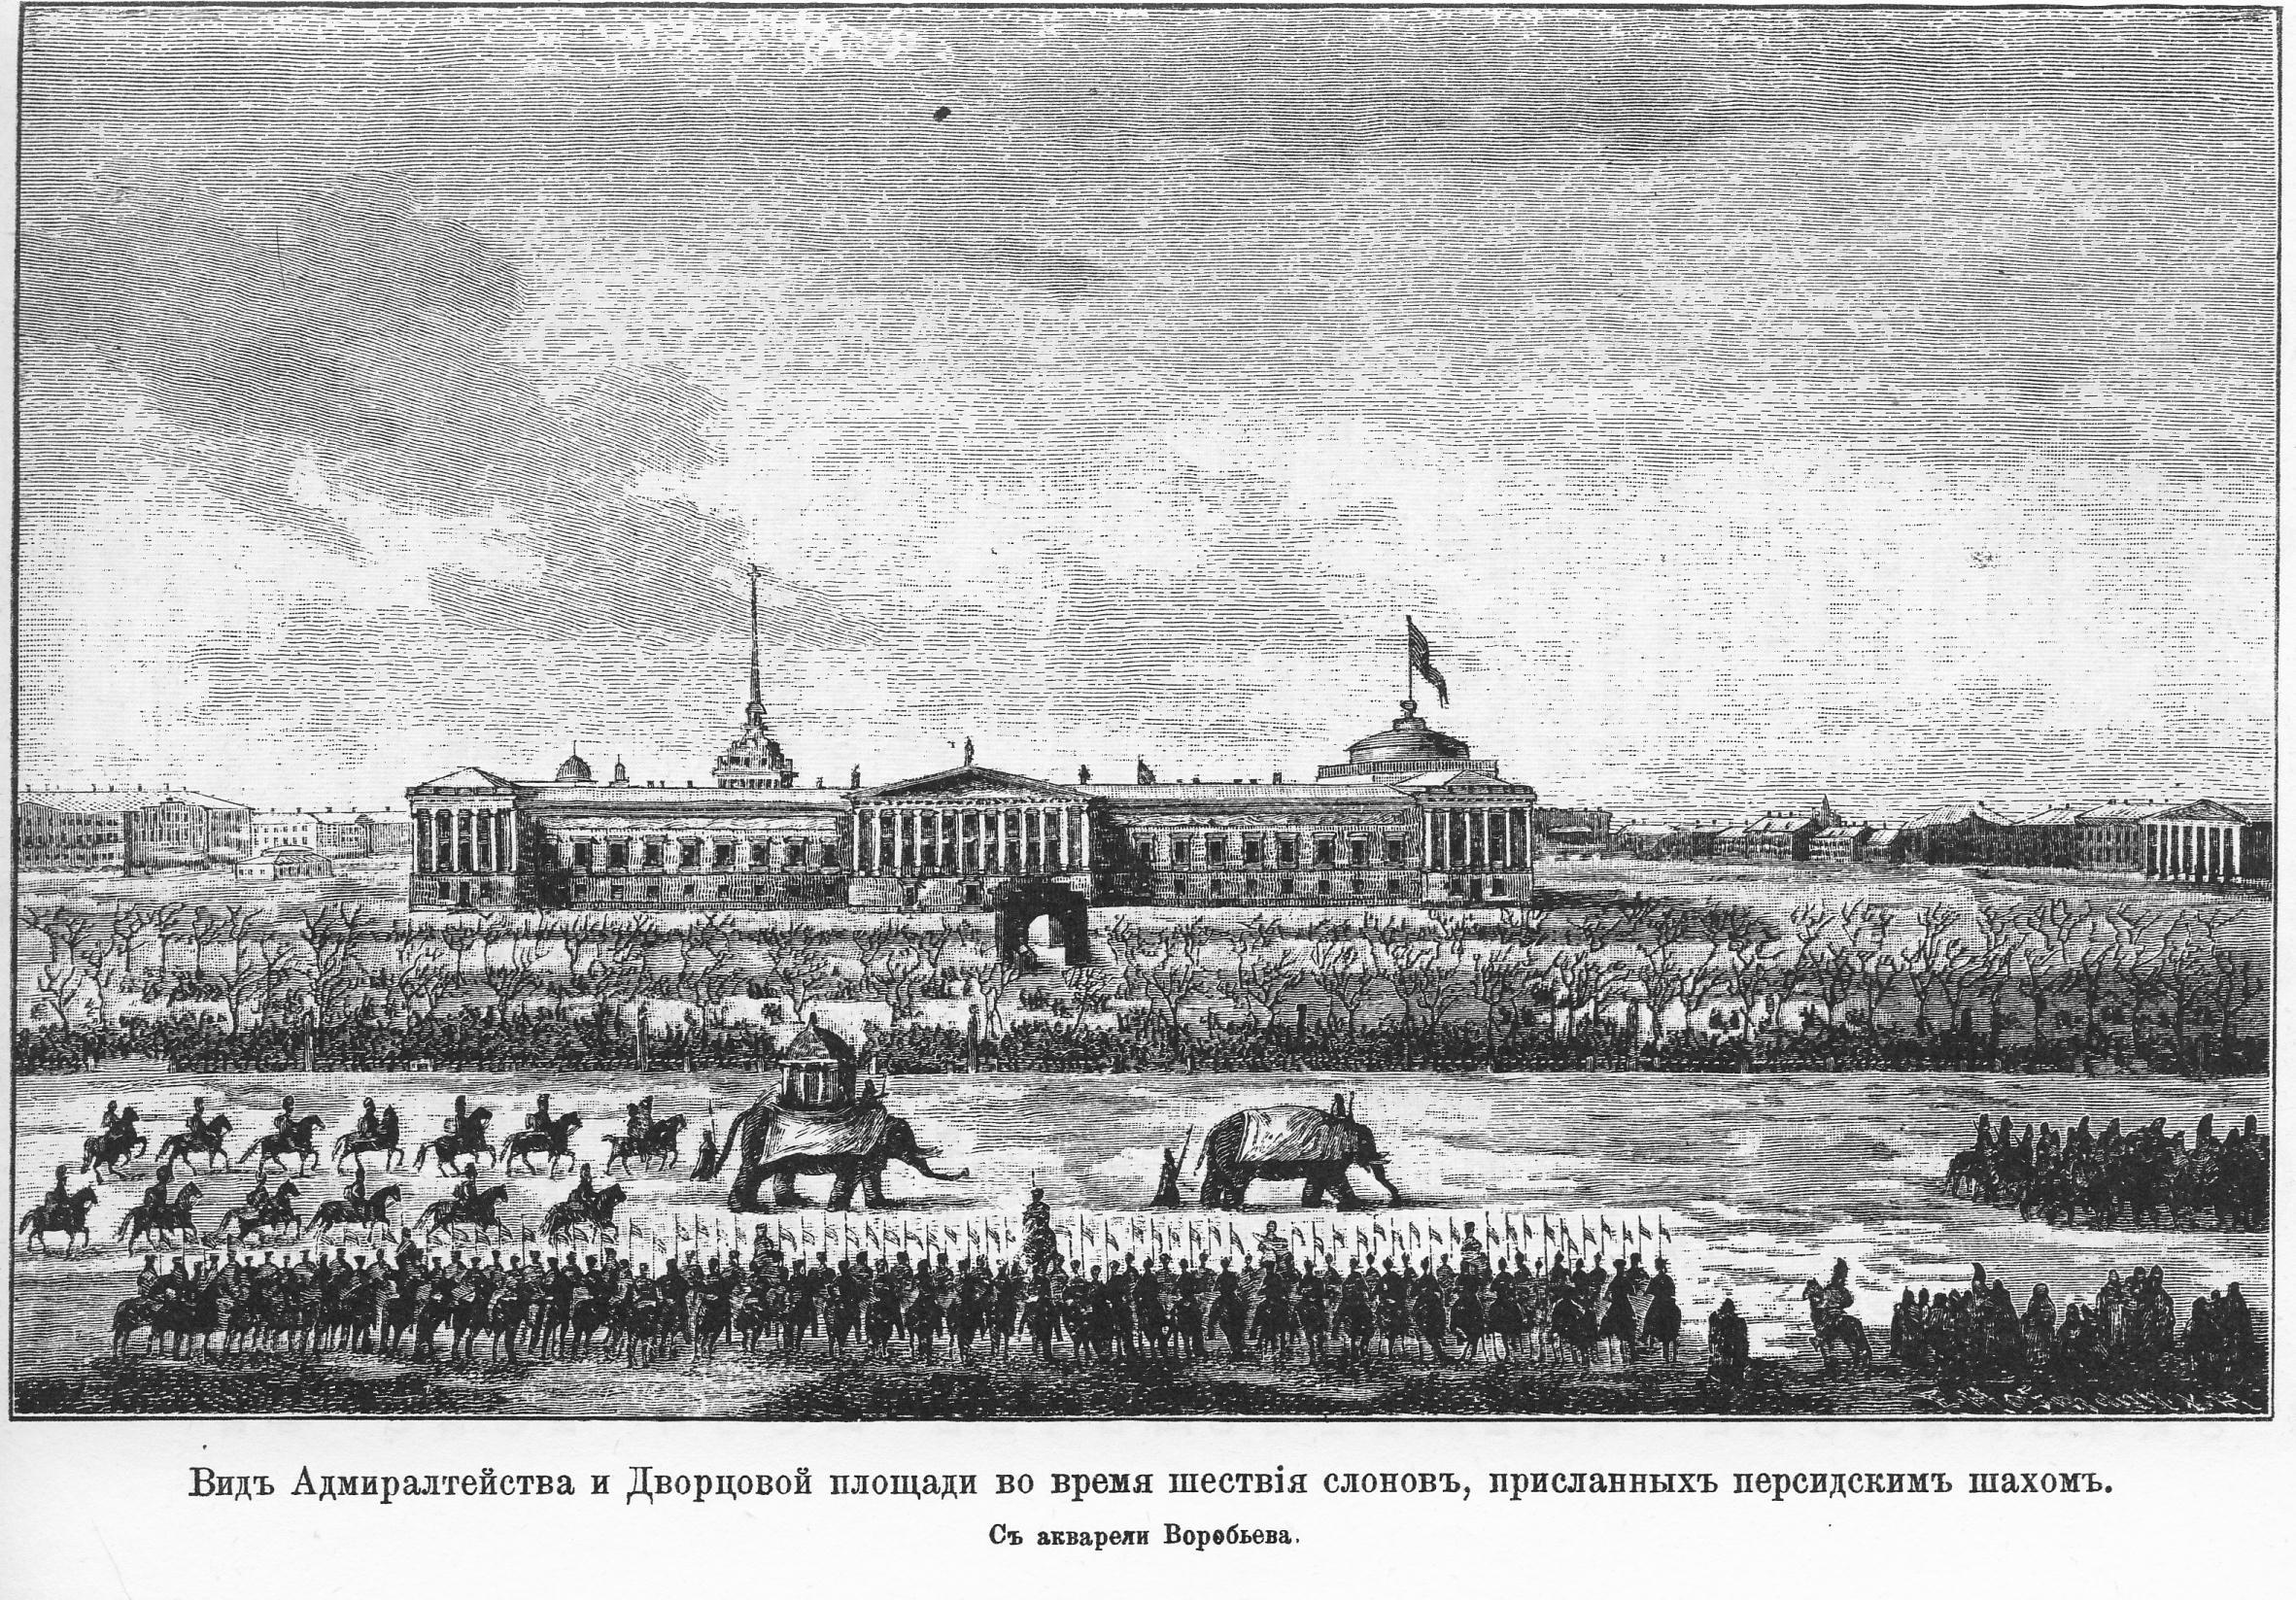 Вид Адмиралтейства